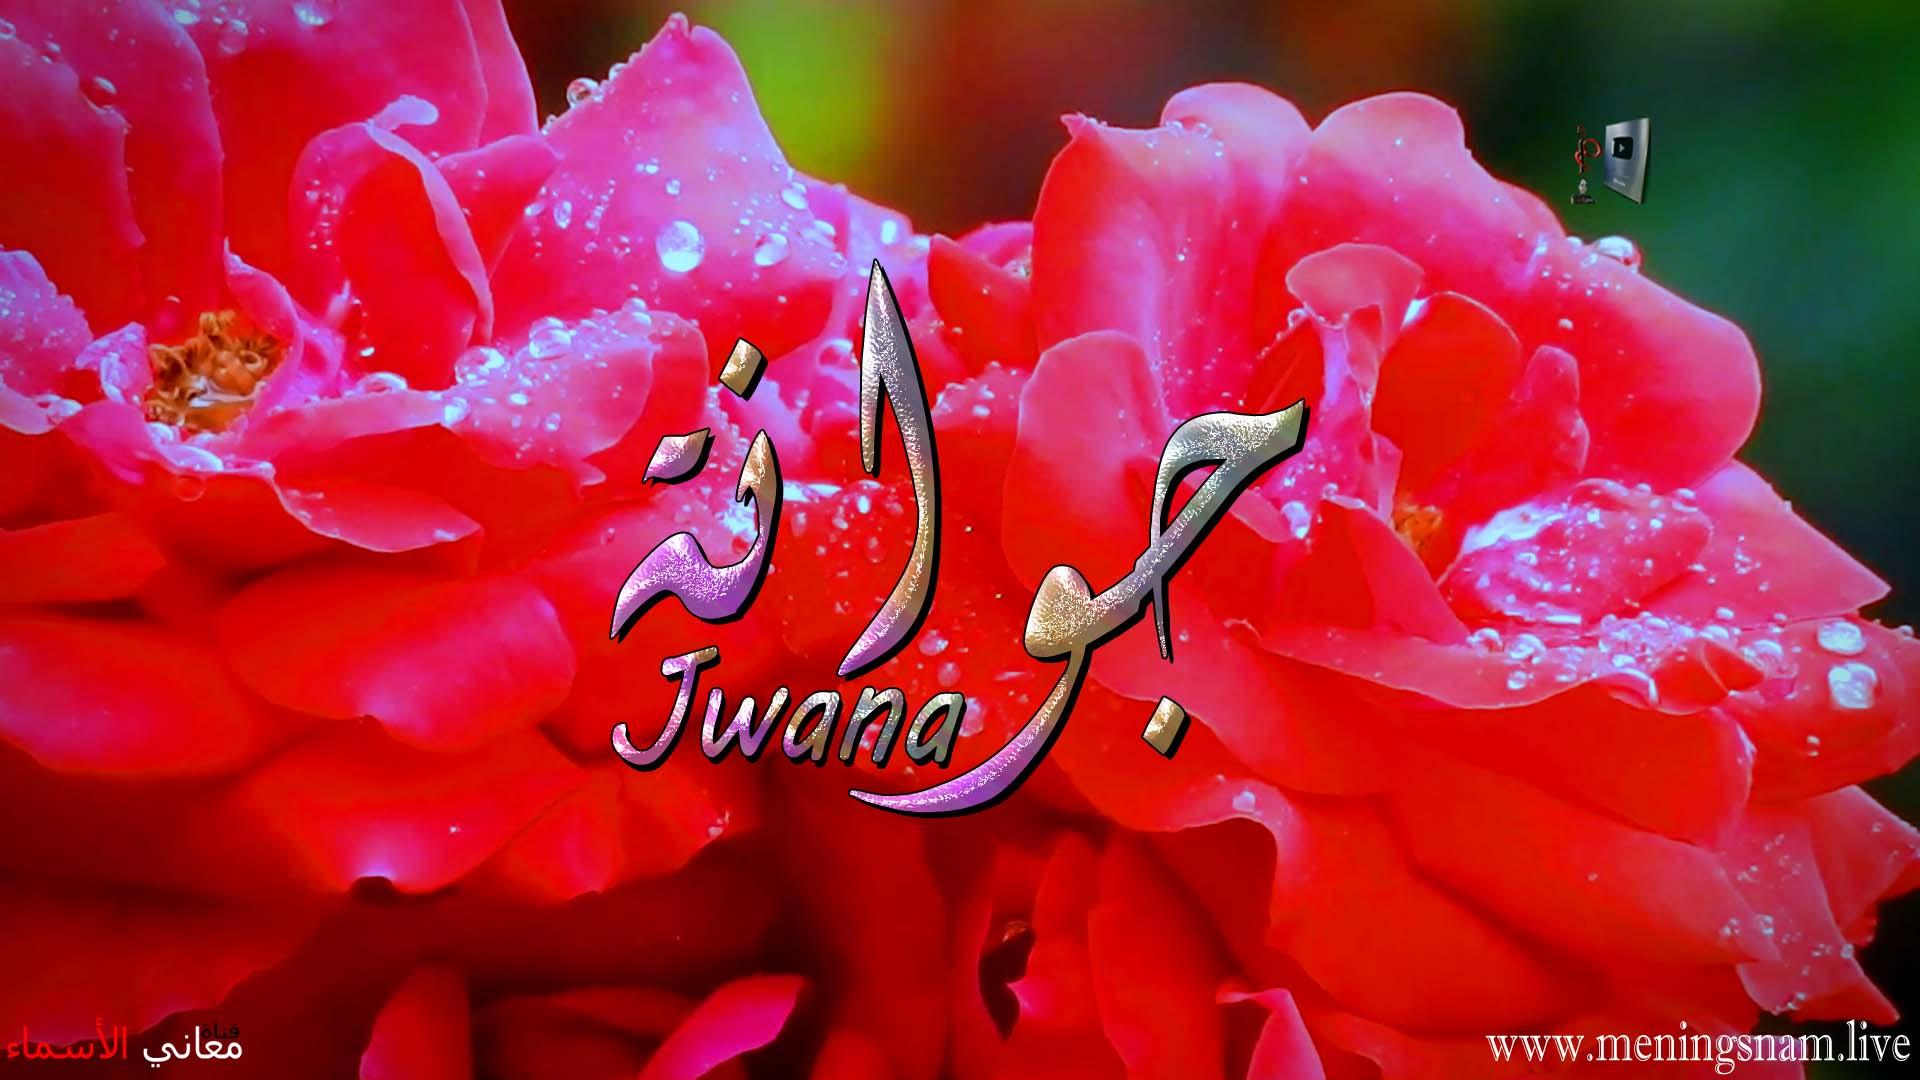 jowan,jowan dragon age,jowana,jowan spice,jowan name meaning, معنى اسم جوانة, وصفات حاملة, هذا الاسم, Jwana,